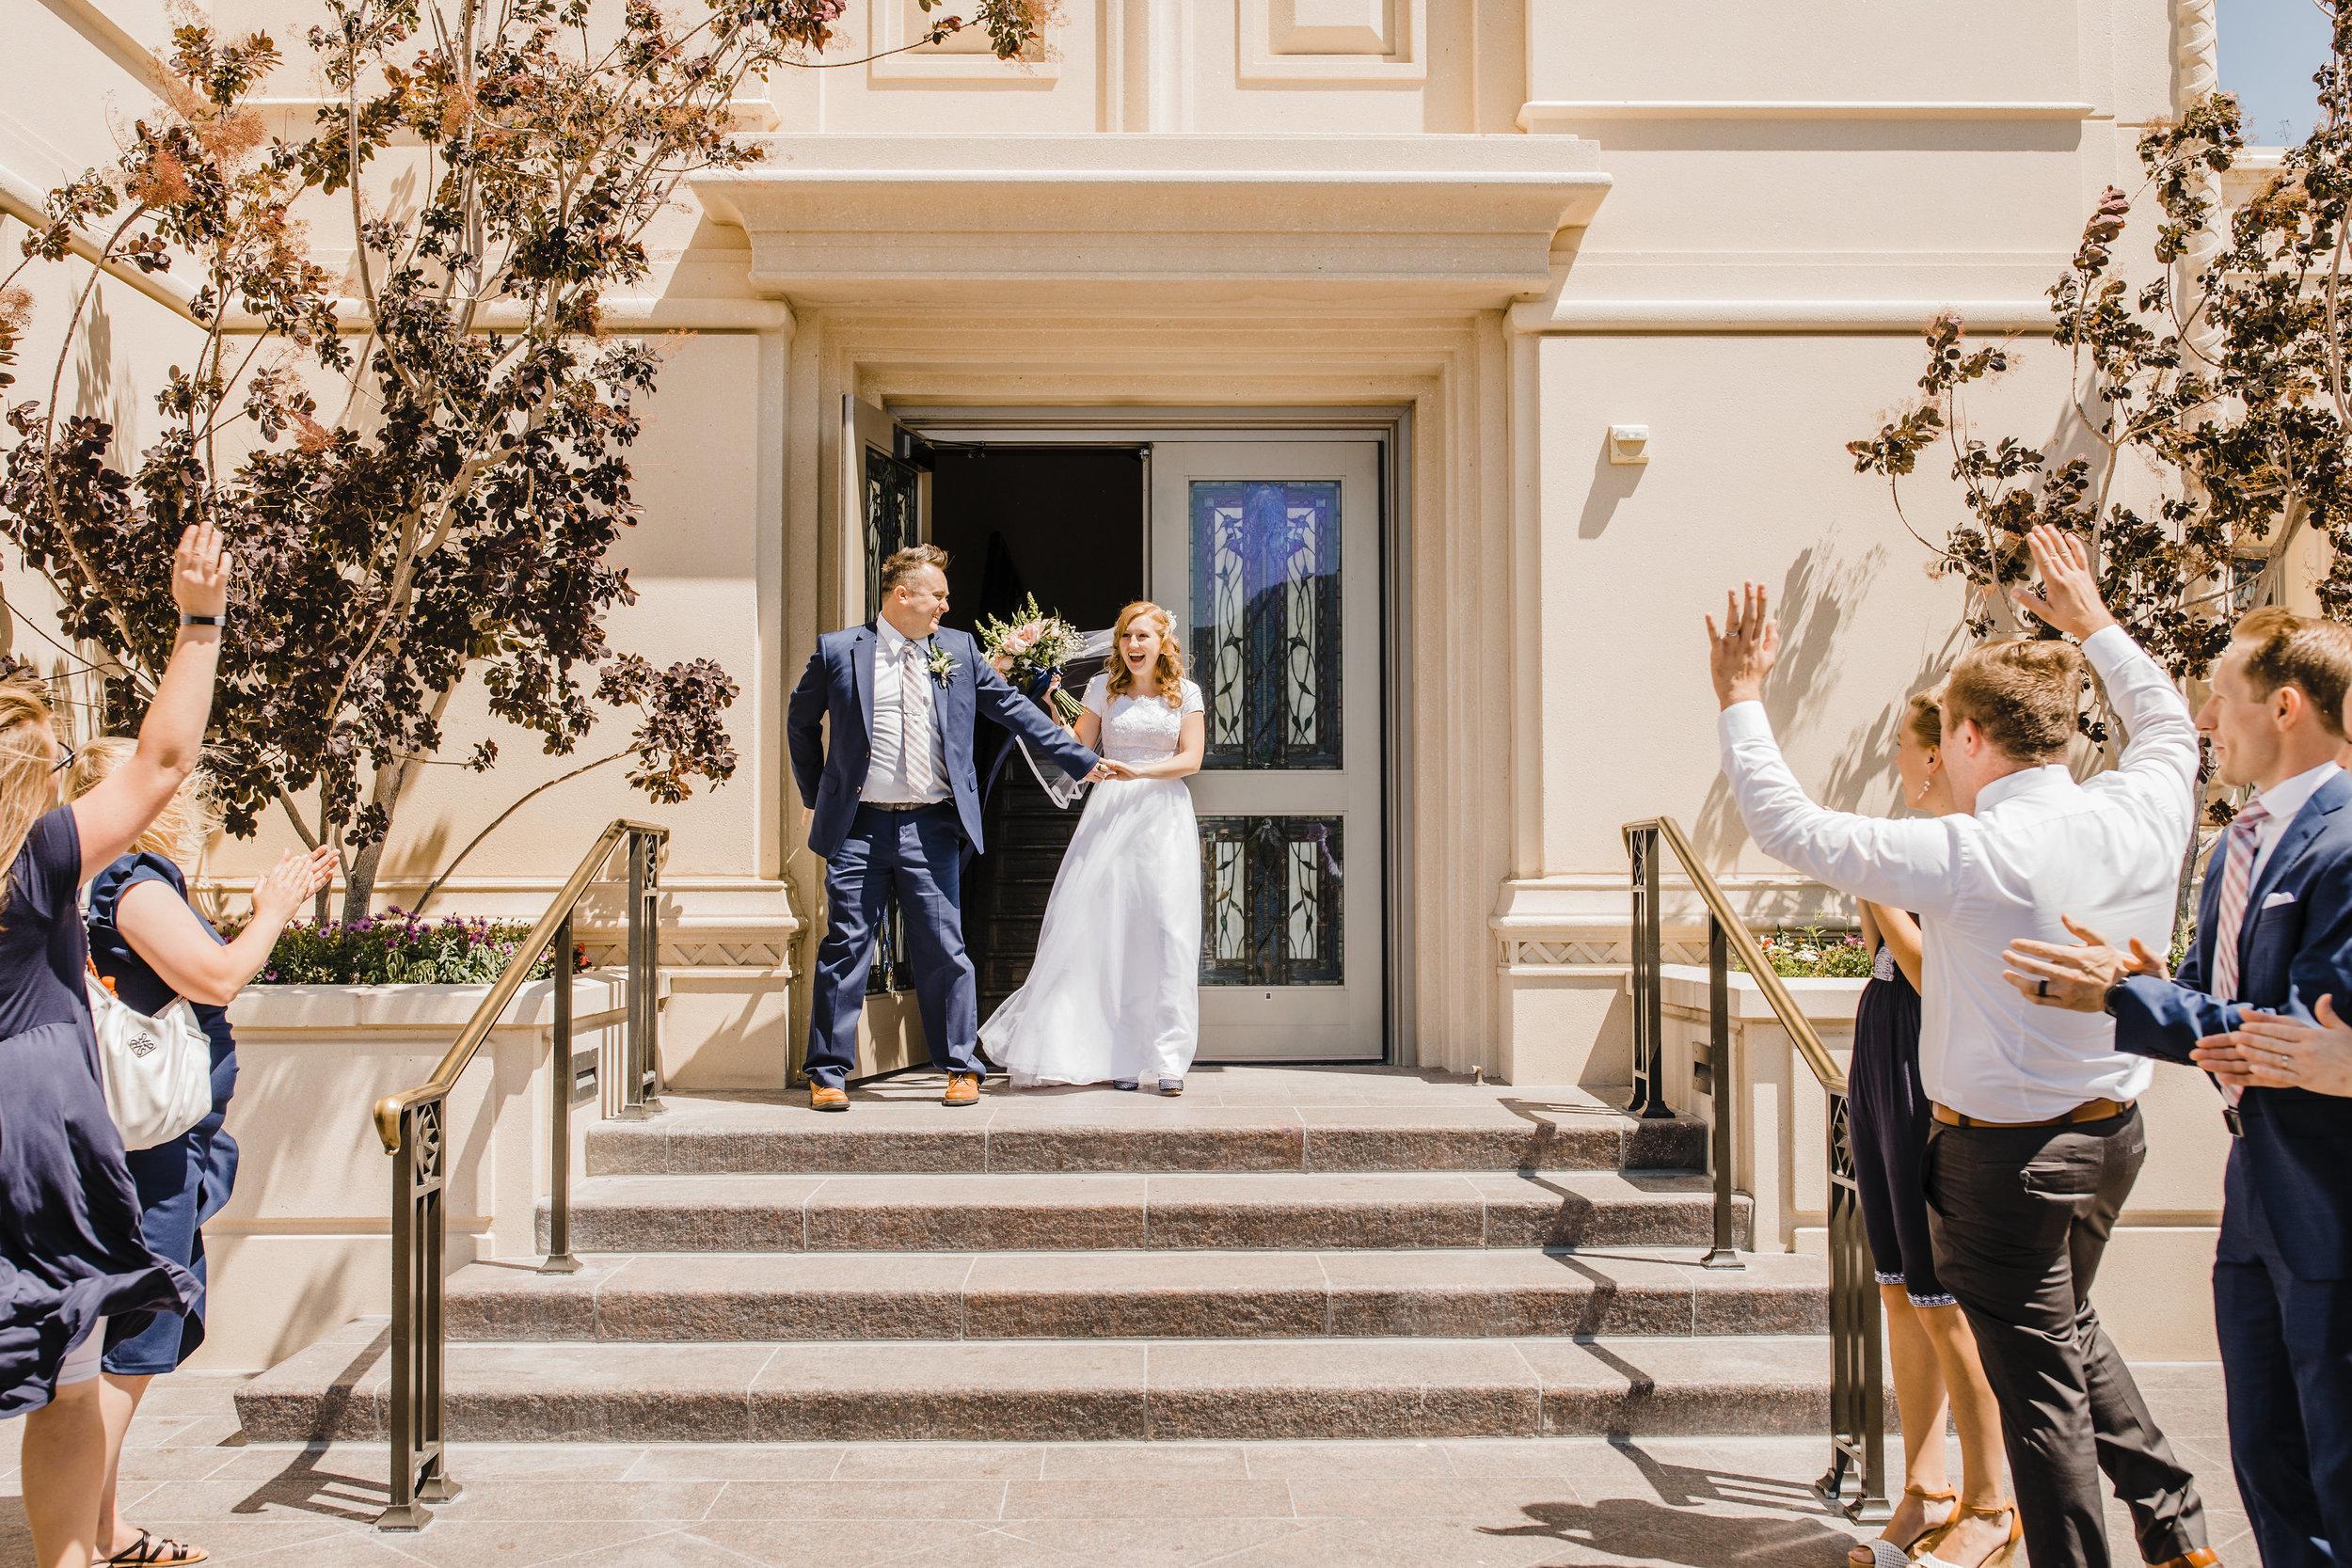 professional wedding photographer in logan utah lds temple exit happy cheering